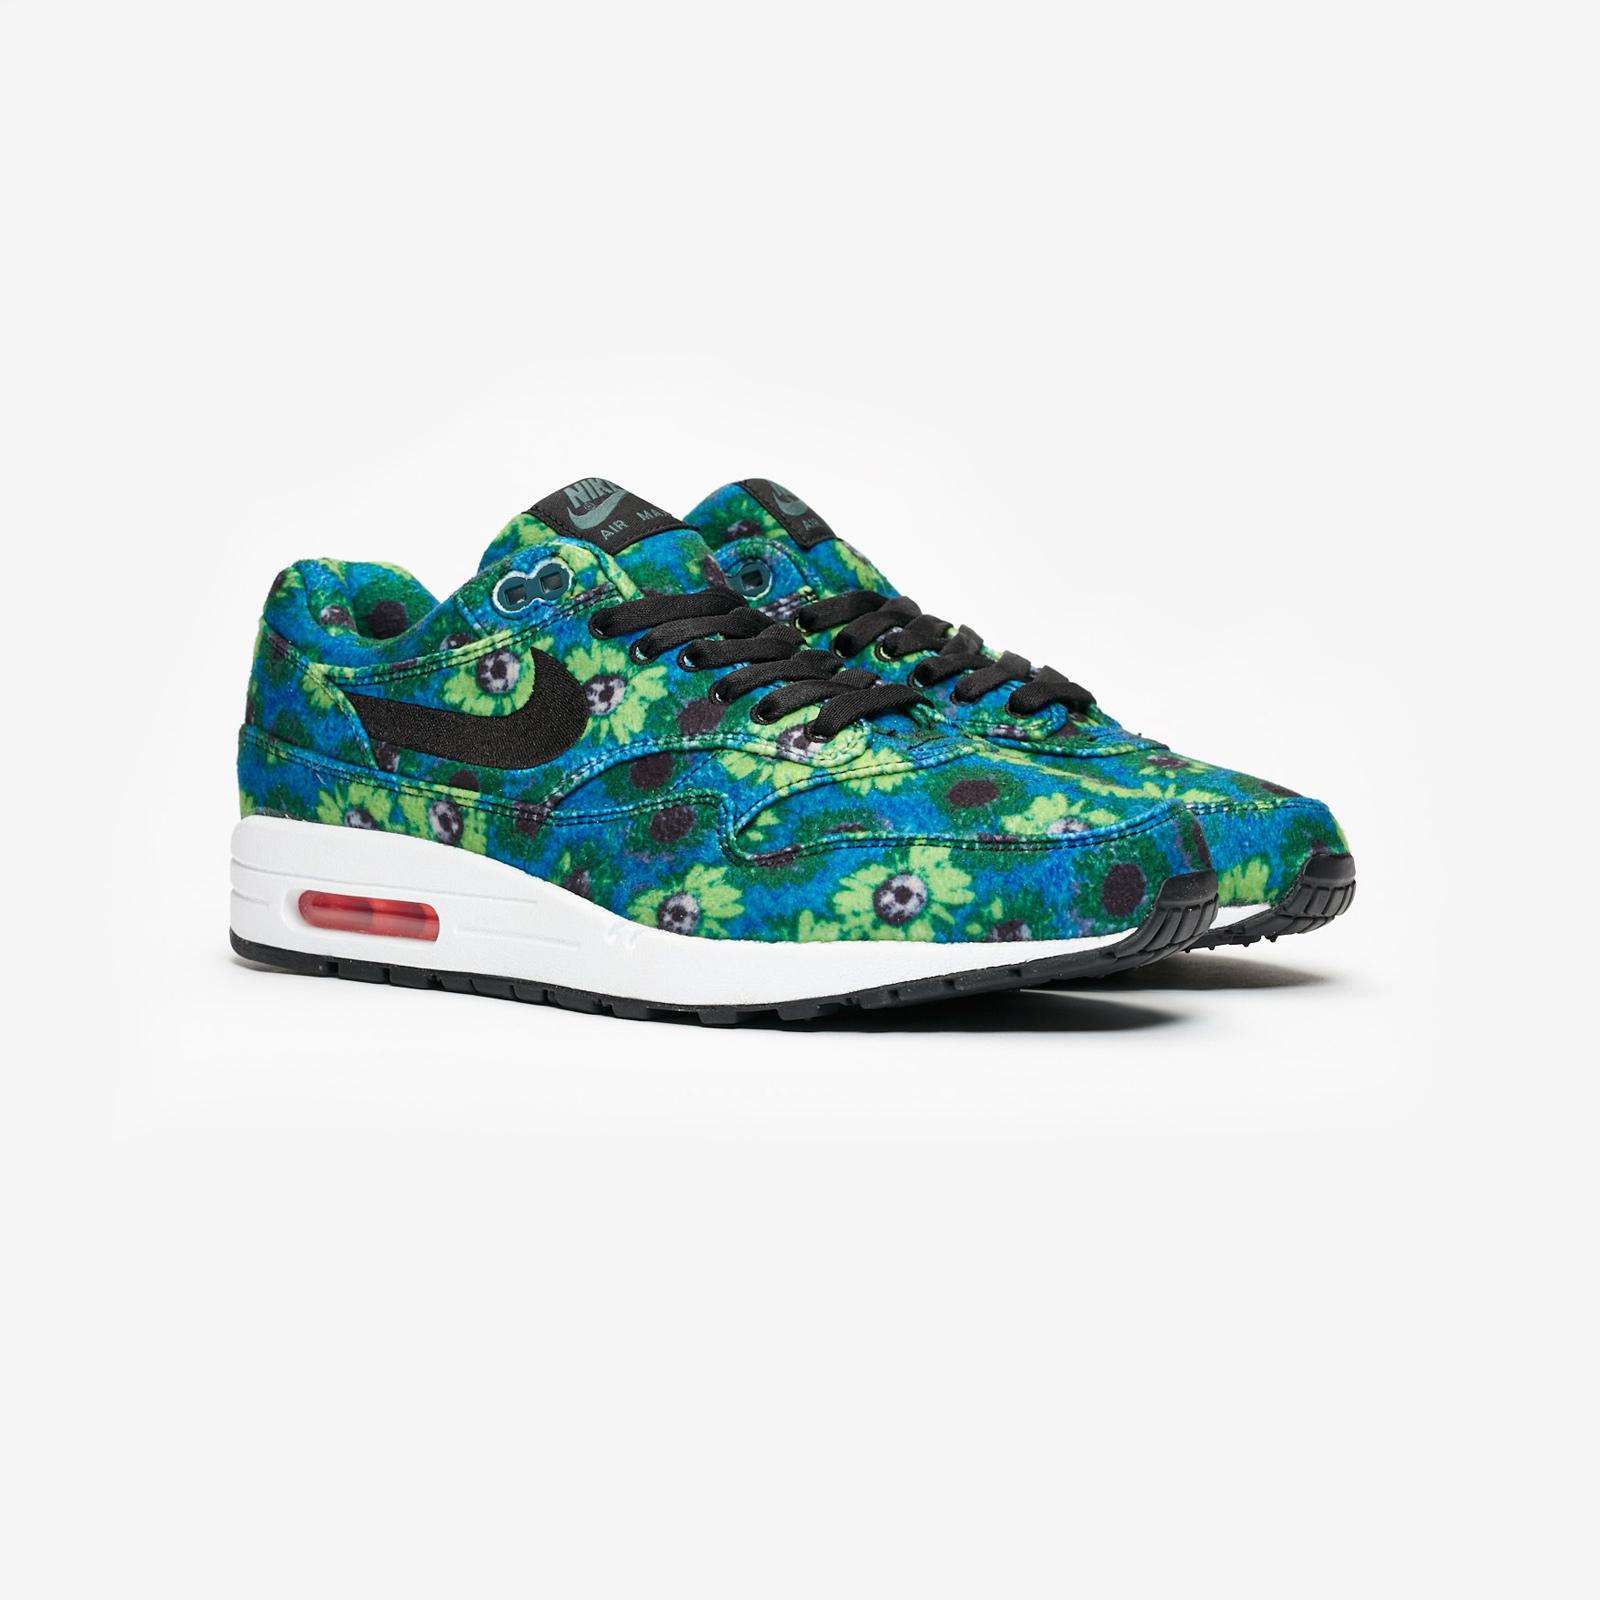 new style 1c5df 28ef3 Nike Sportswear Air Max 1 Premium SE